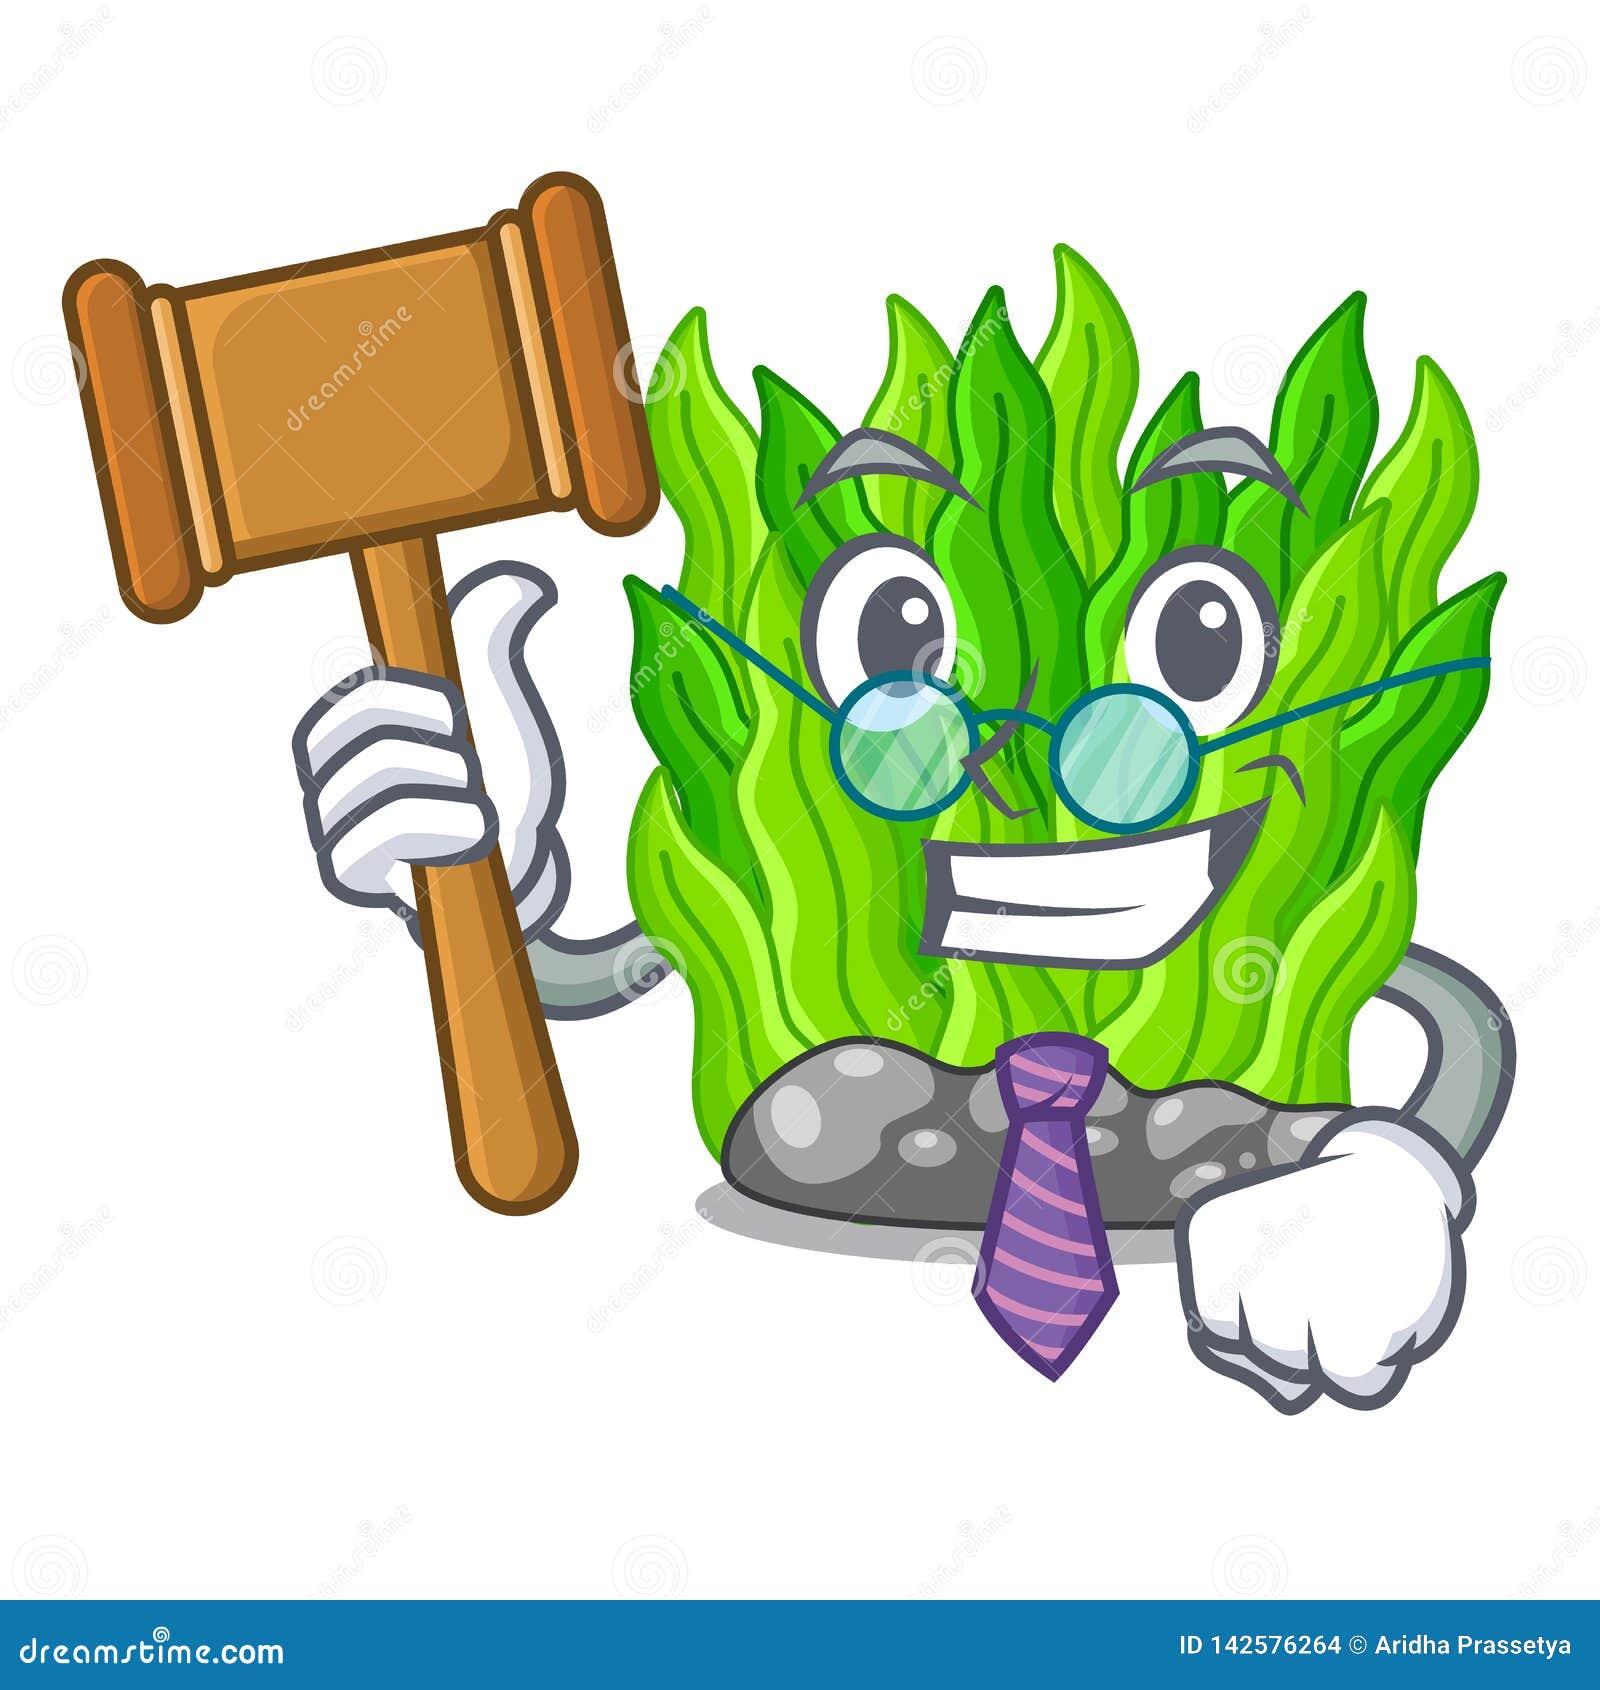 Judge green seaweed in a cartoon aquarium